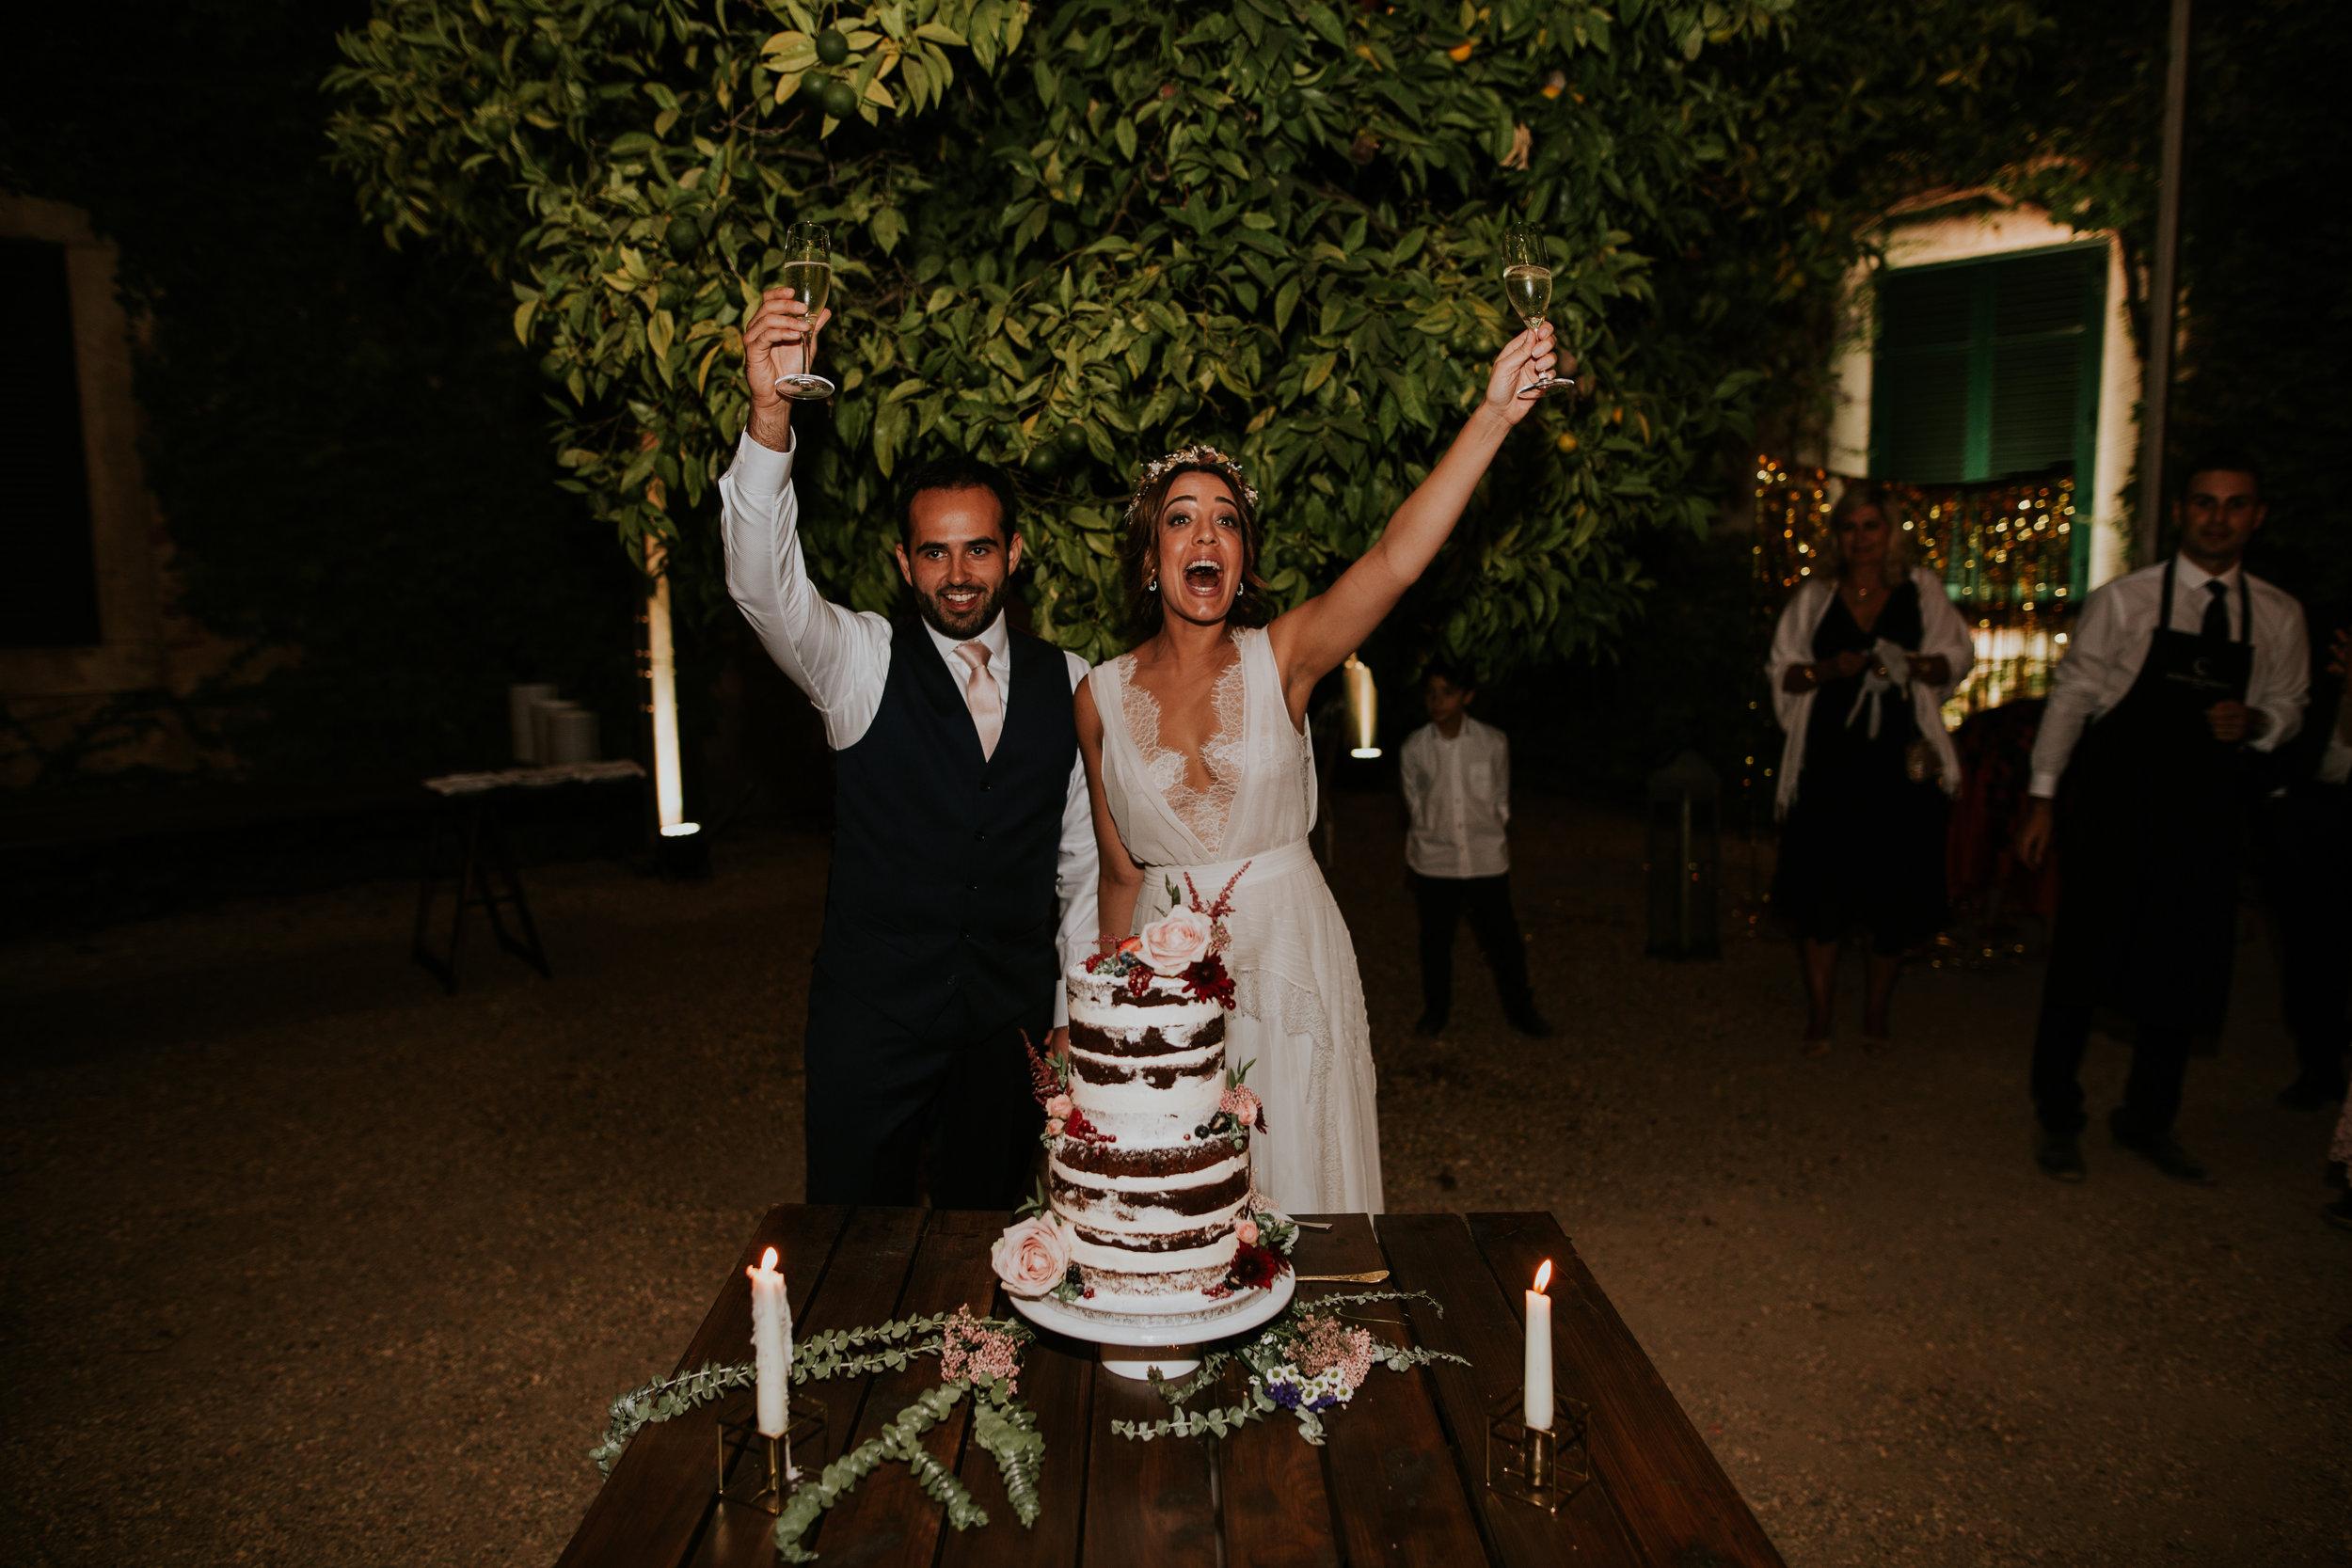 R&J890_ 09 setembro 2017 Wedding day_.jpg